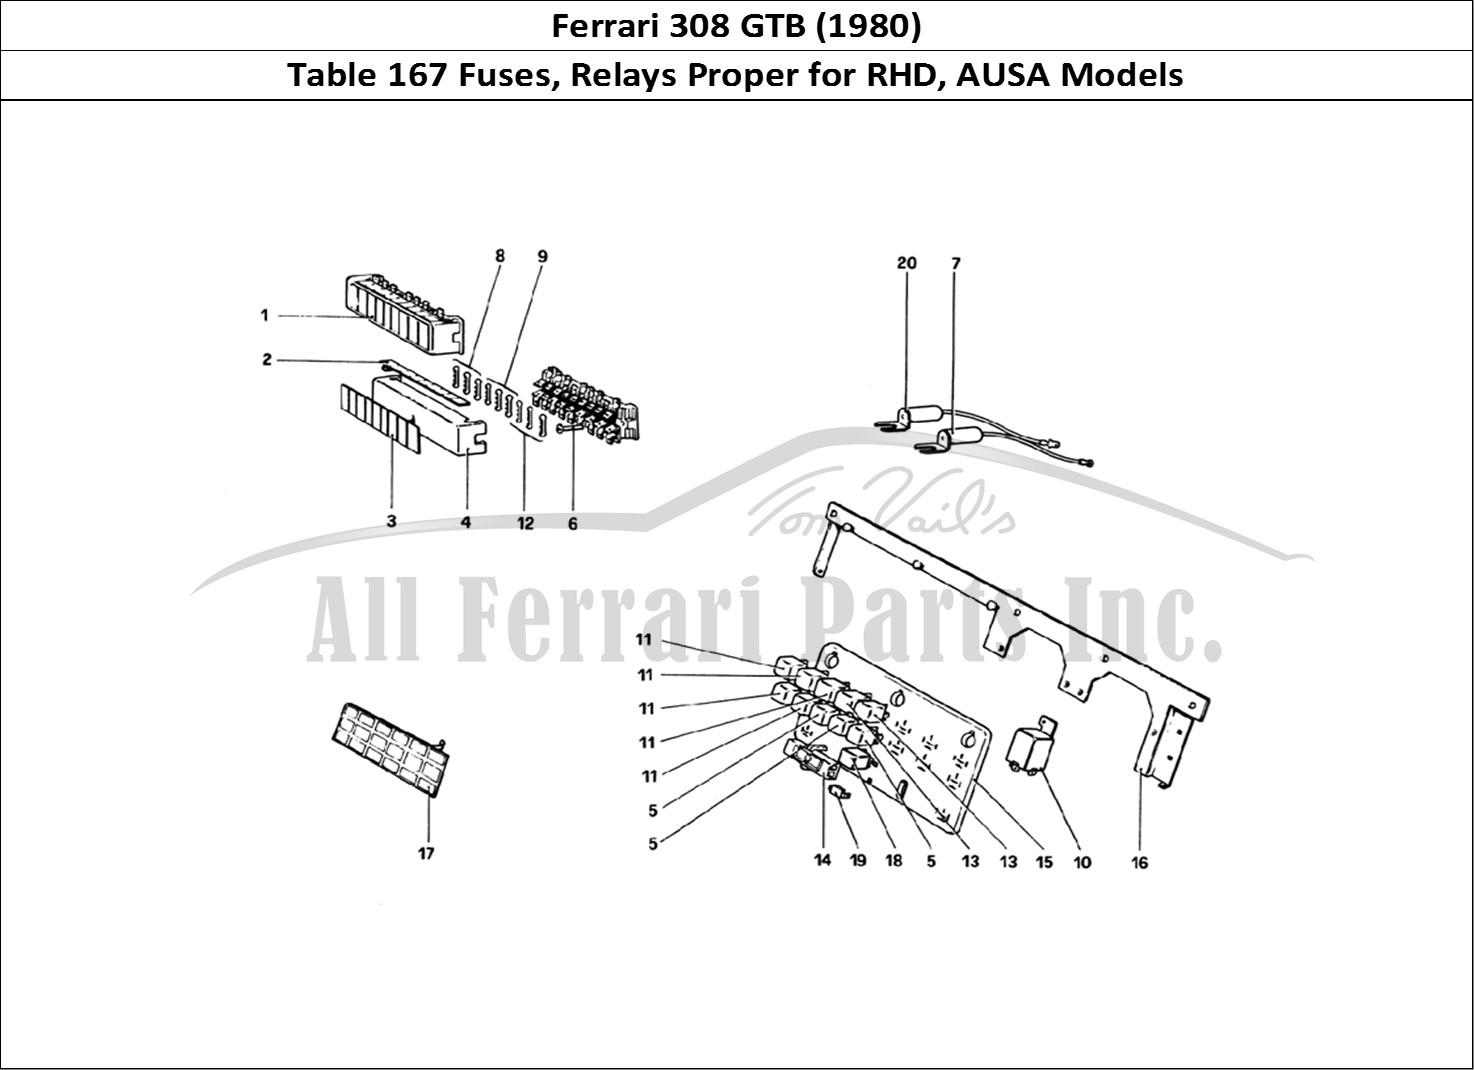 Buy original Ferrari 308 GTB (1980) 167 Fuses, Relays